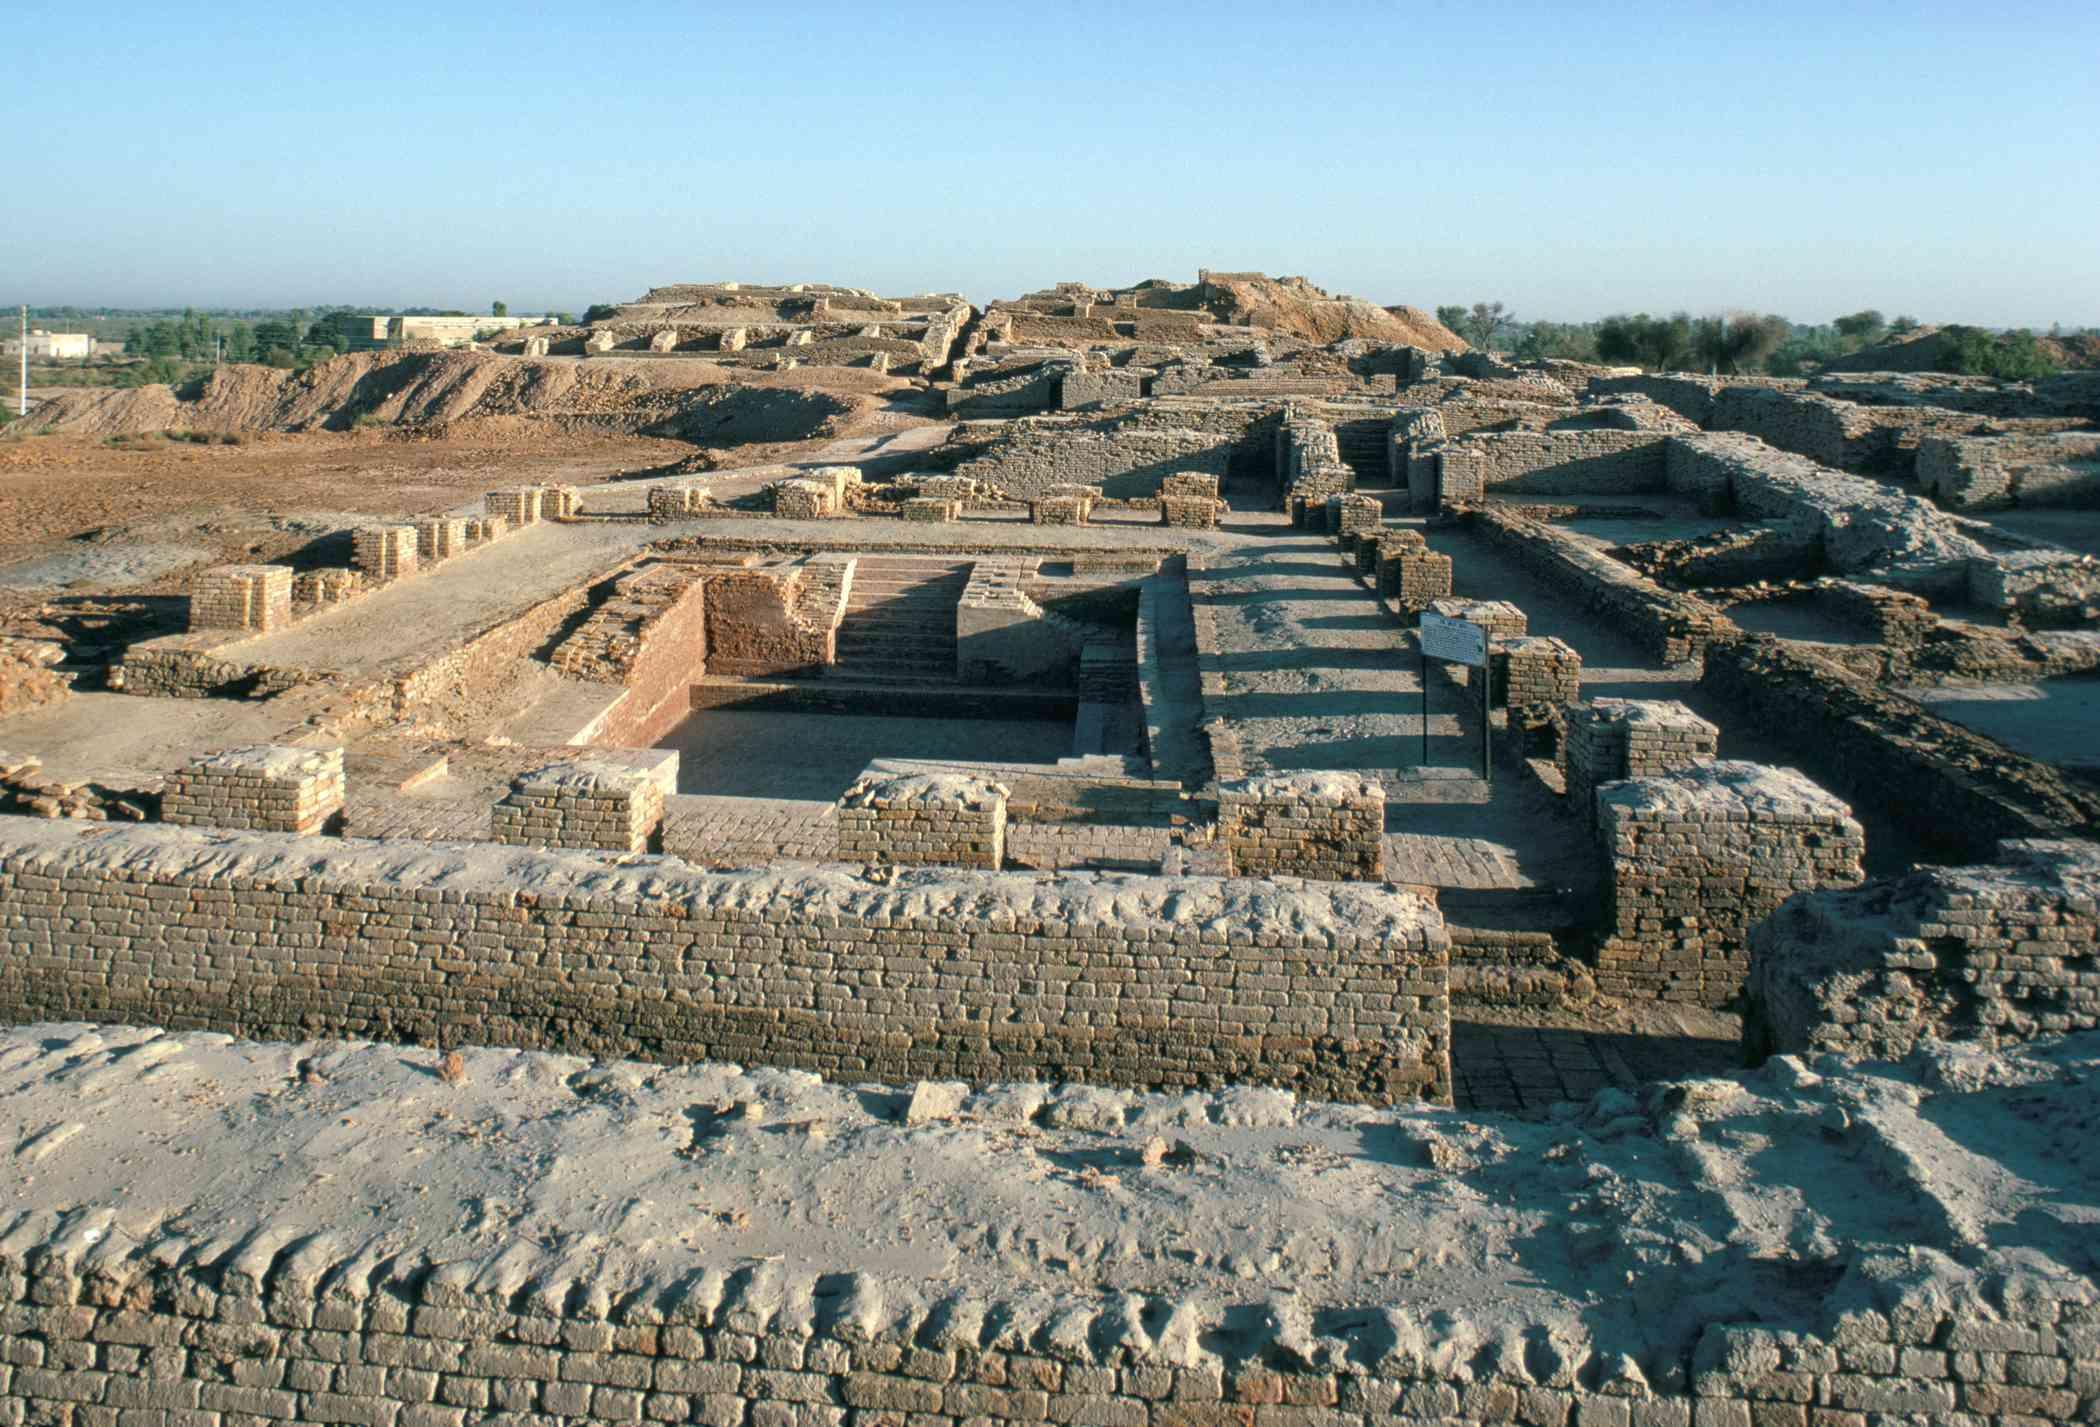 Ritual bath in the citadel, Mohenjodaro, UNESCO World Heritage Site, Indus Valley civilization